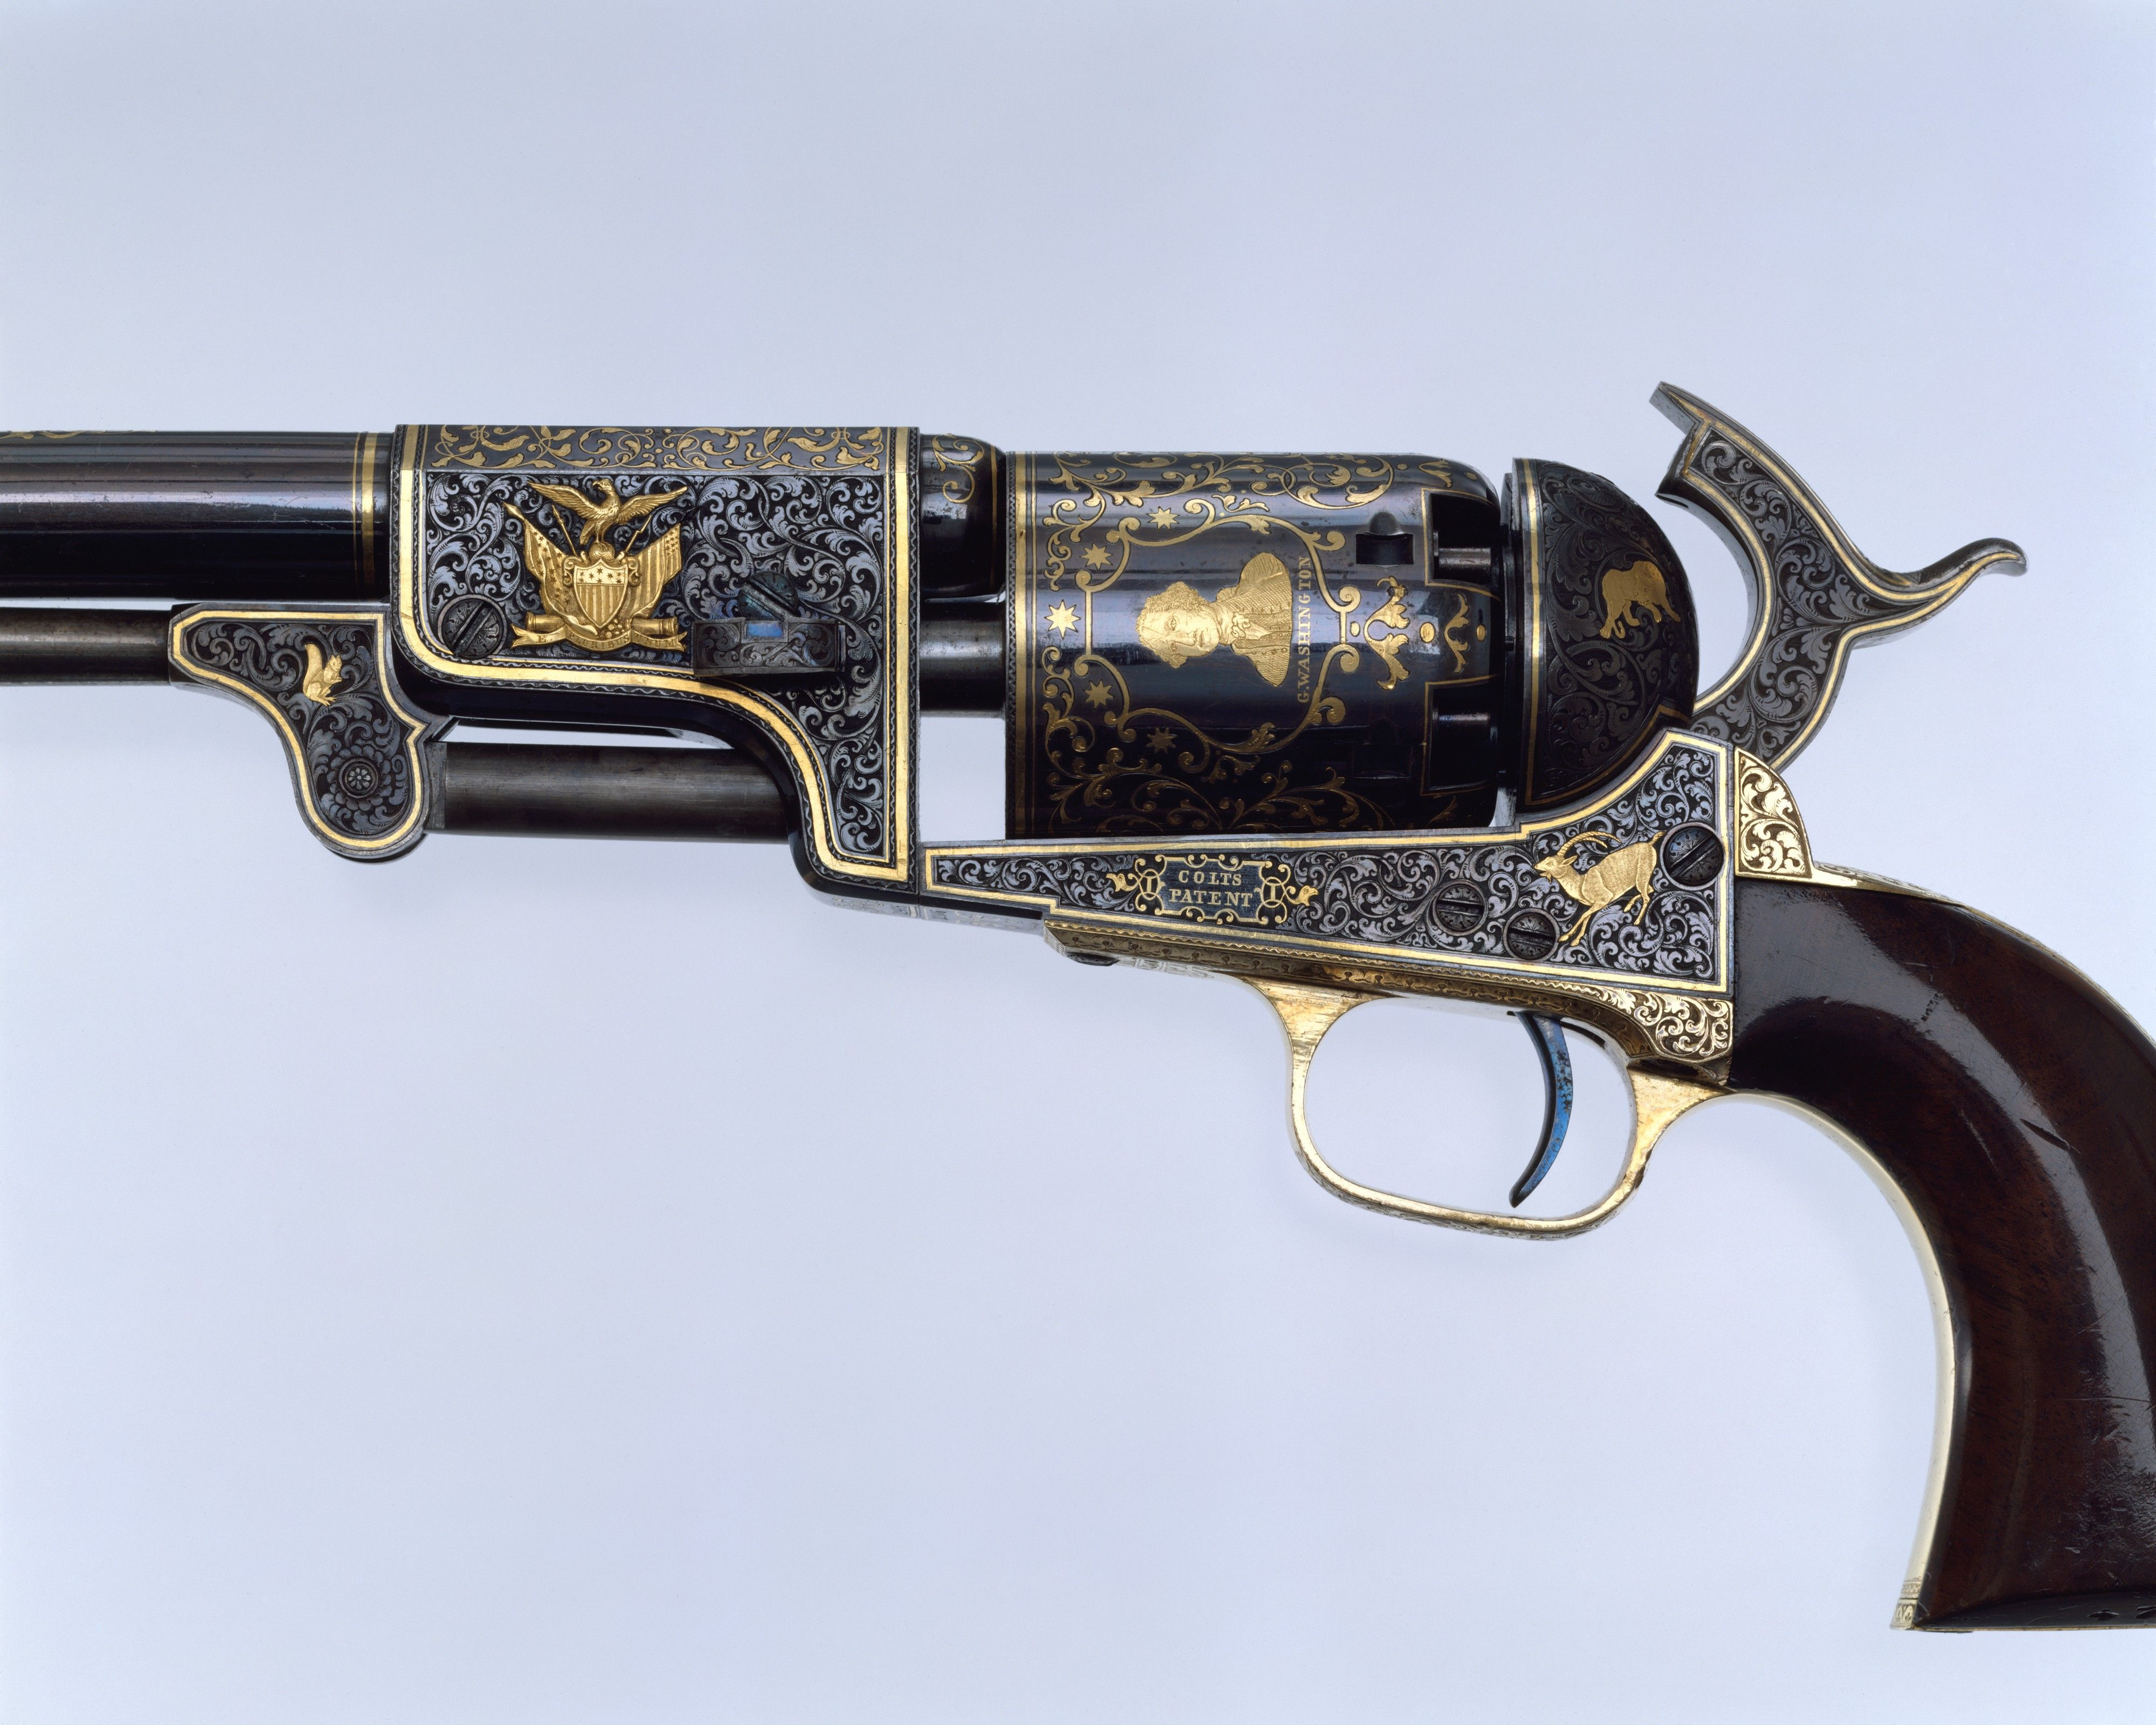 a biography of samuel colt a gun manufacturer The colt revolver was a godsend to young colt designed an innovative gun with an a texas ranger, captain samuel walker, wrote colt a testimonial.